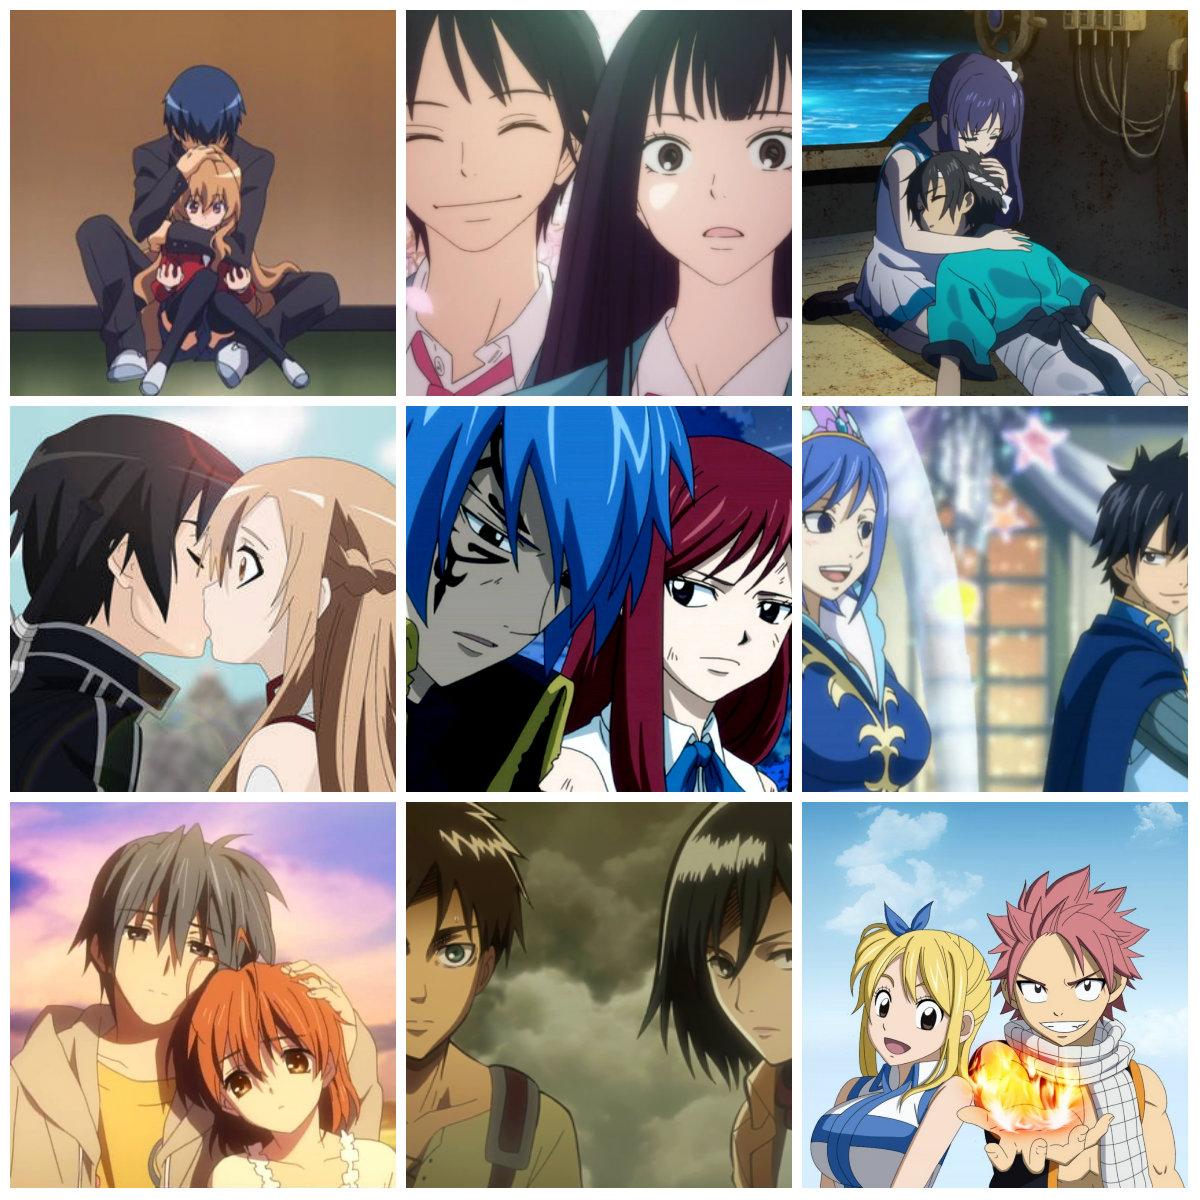 Image - Kieran anime ships collage.jpg | Degrassi Wiki | FANDOM ...